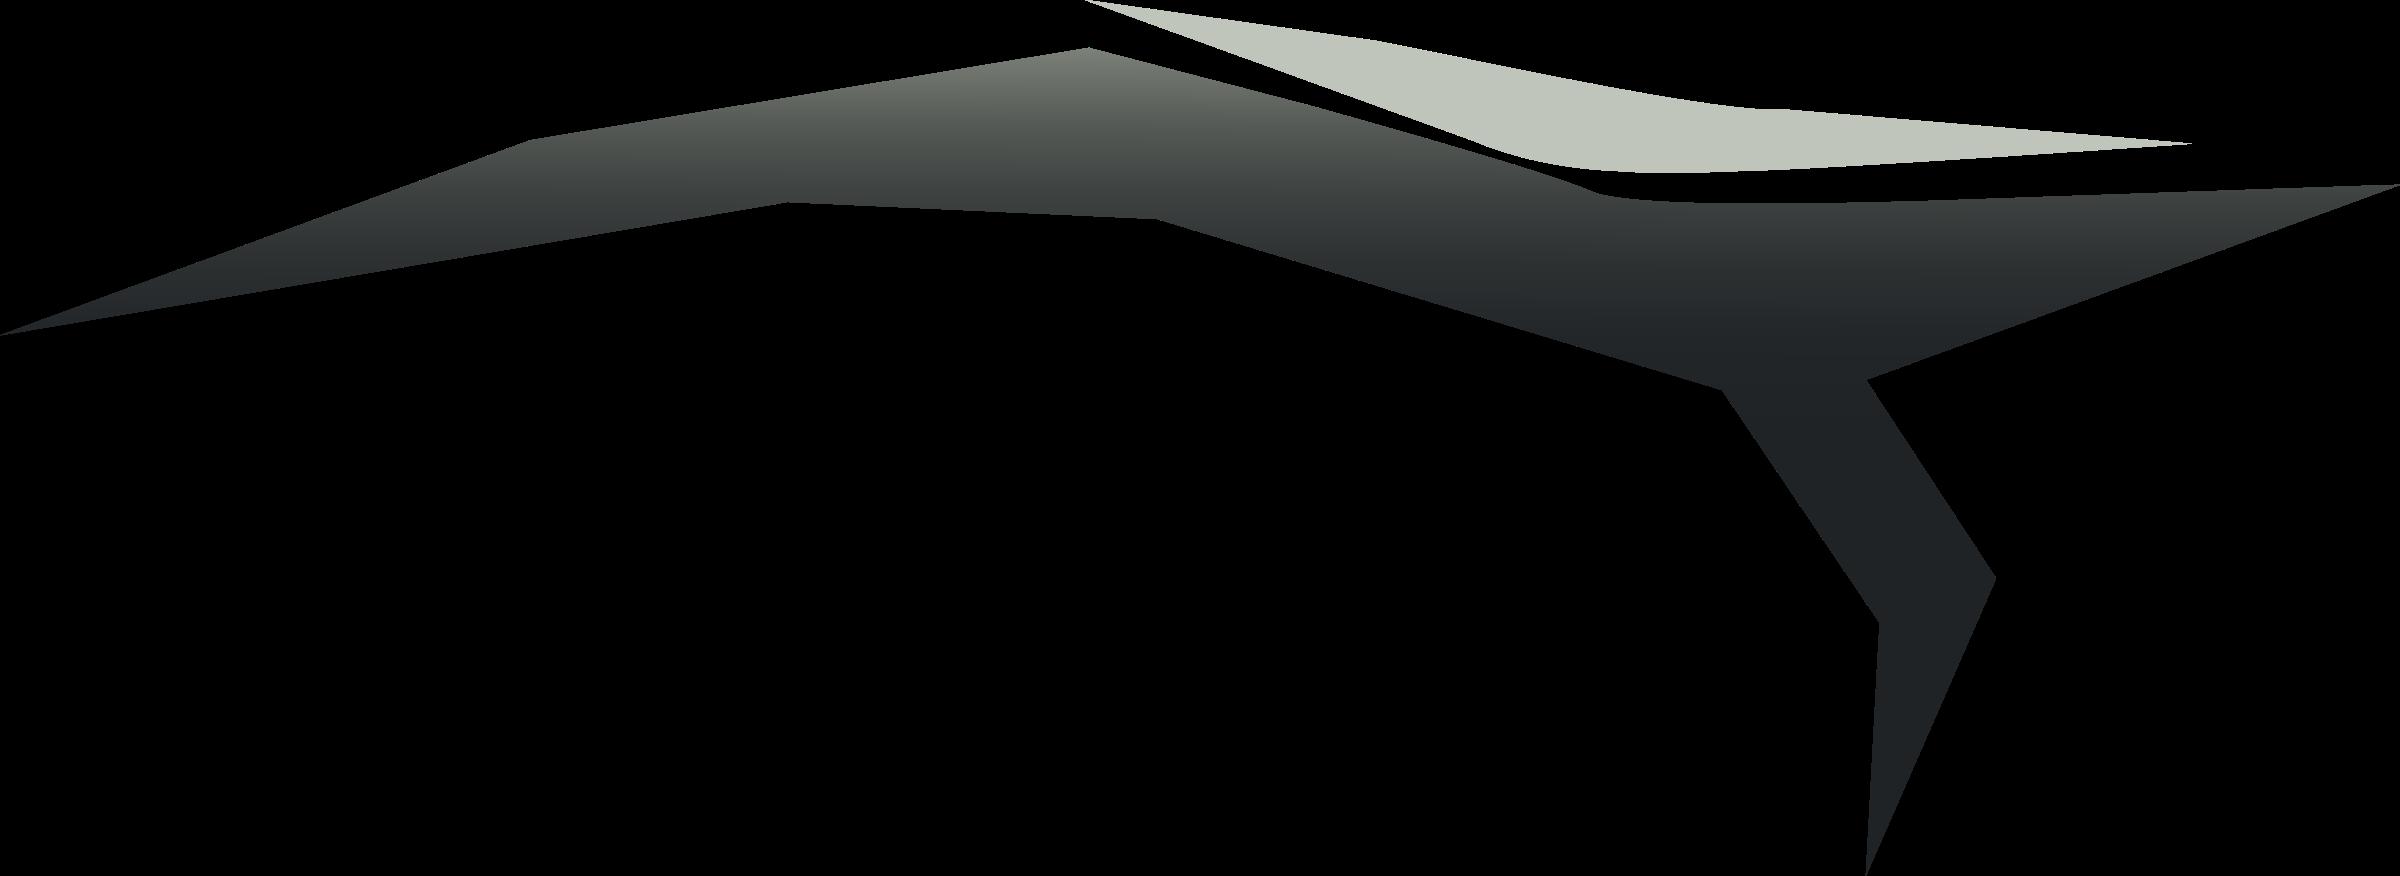 Glitch clipart black and white Clipart 4 Ilmenskie (PNG) IMAGE